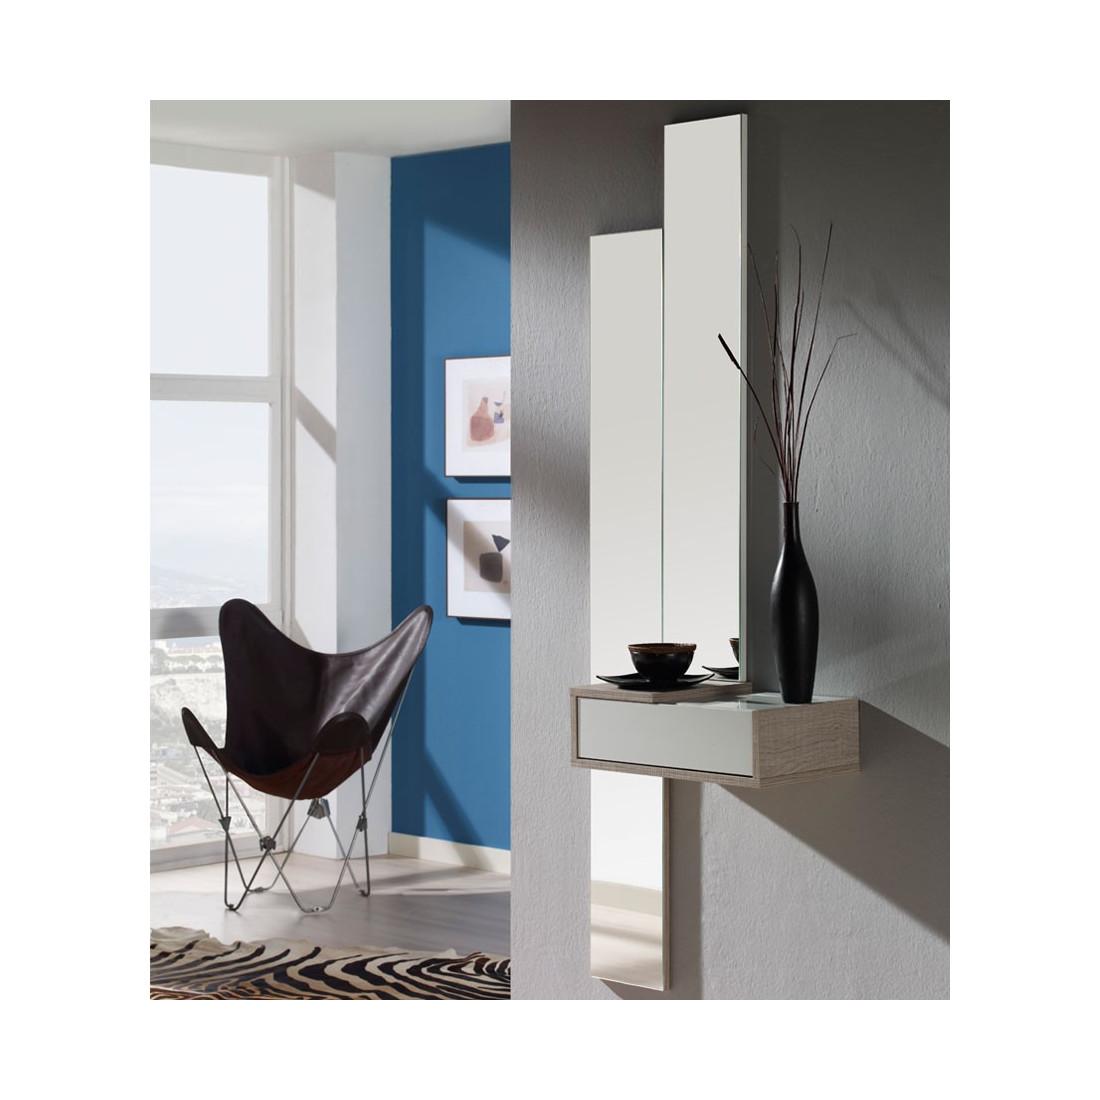 meuble d 39 entr e blanc ch ne clair miroir nyla univers petits meubles. Black Bedroom Furniture Sets. Home Design Ideas